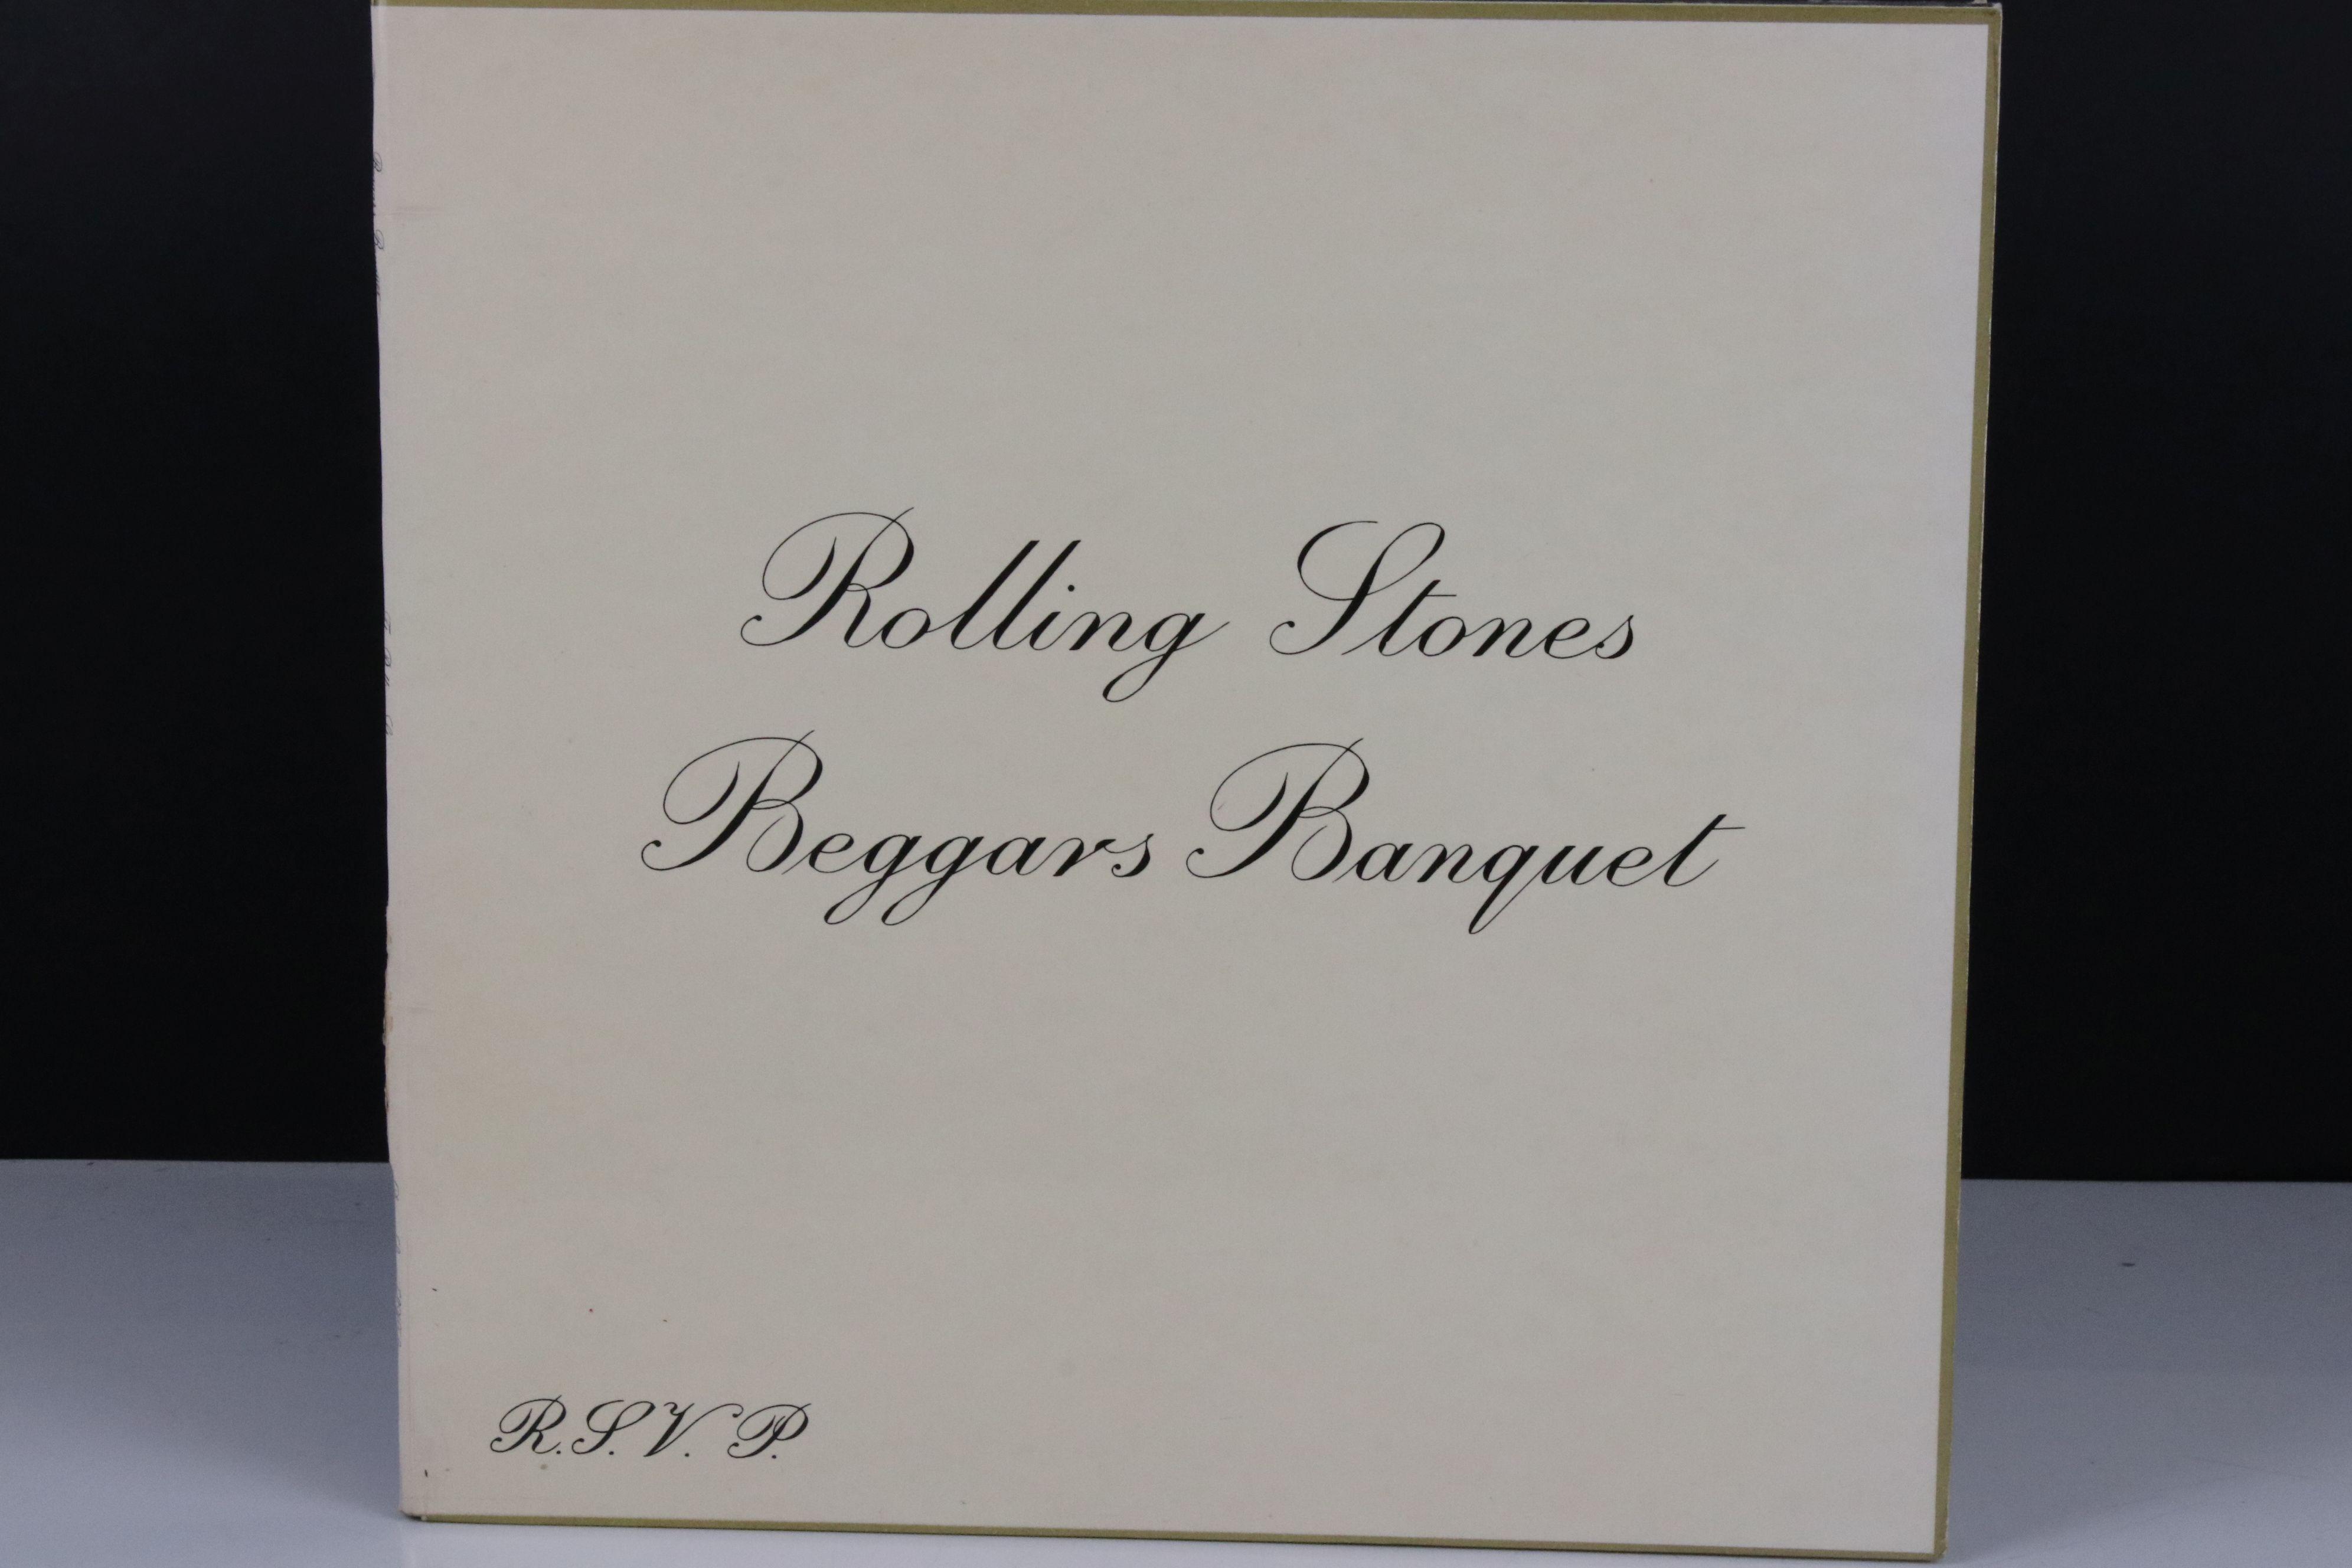 Vinyl - The Rolling Stones Beggars Banquet (SKL 4955) blue Decca label, Mirage Music, titles